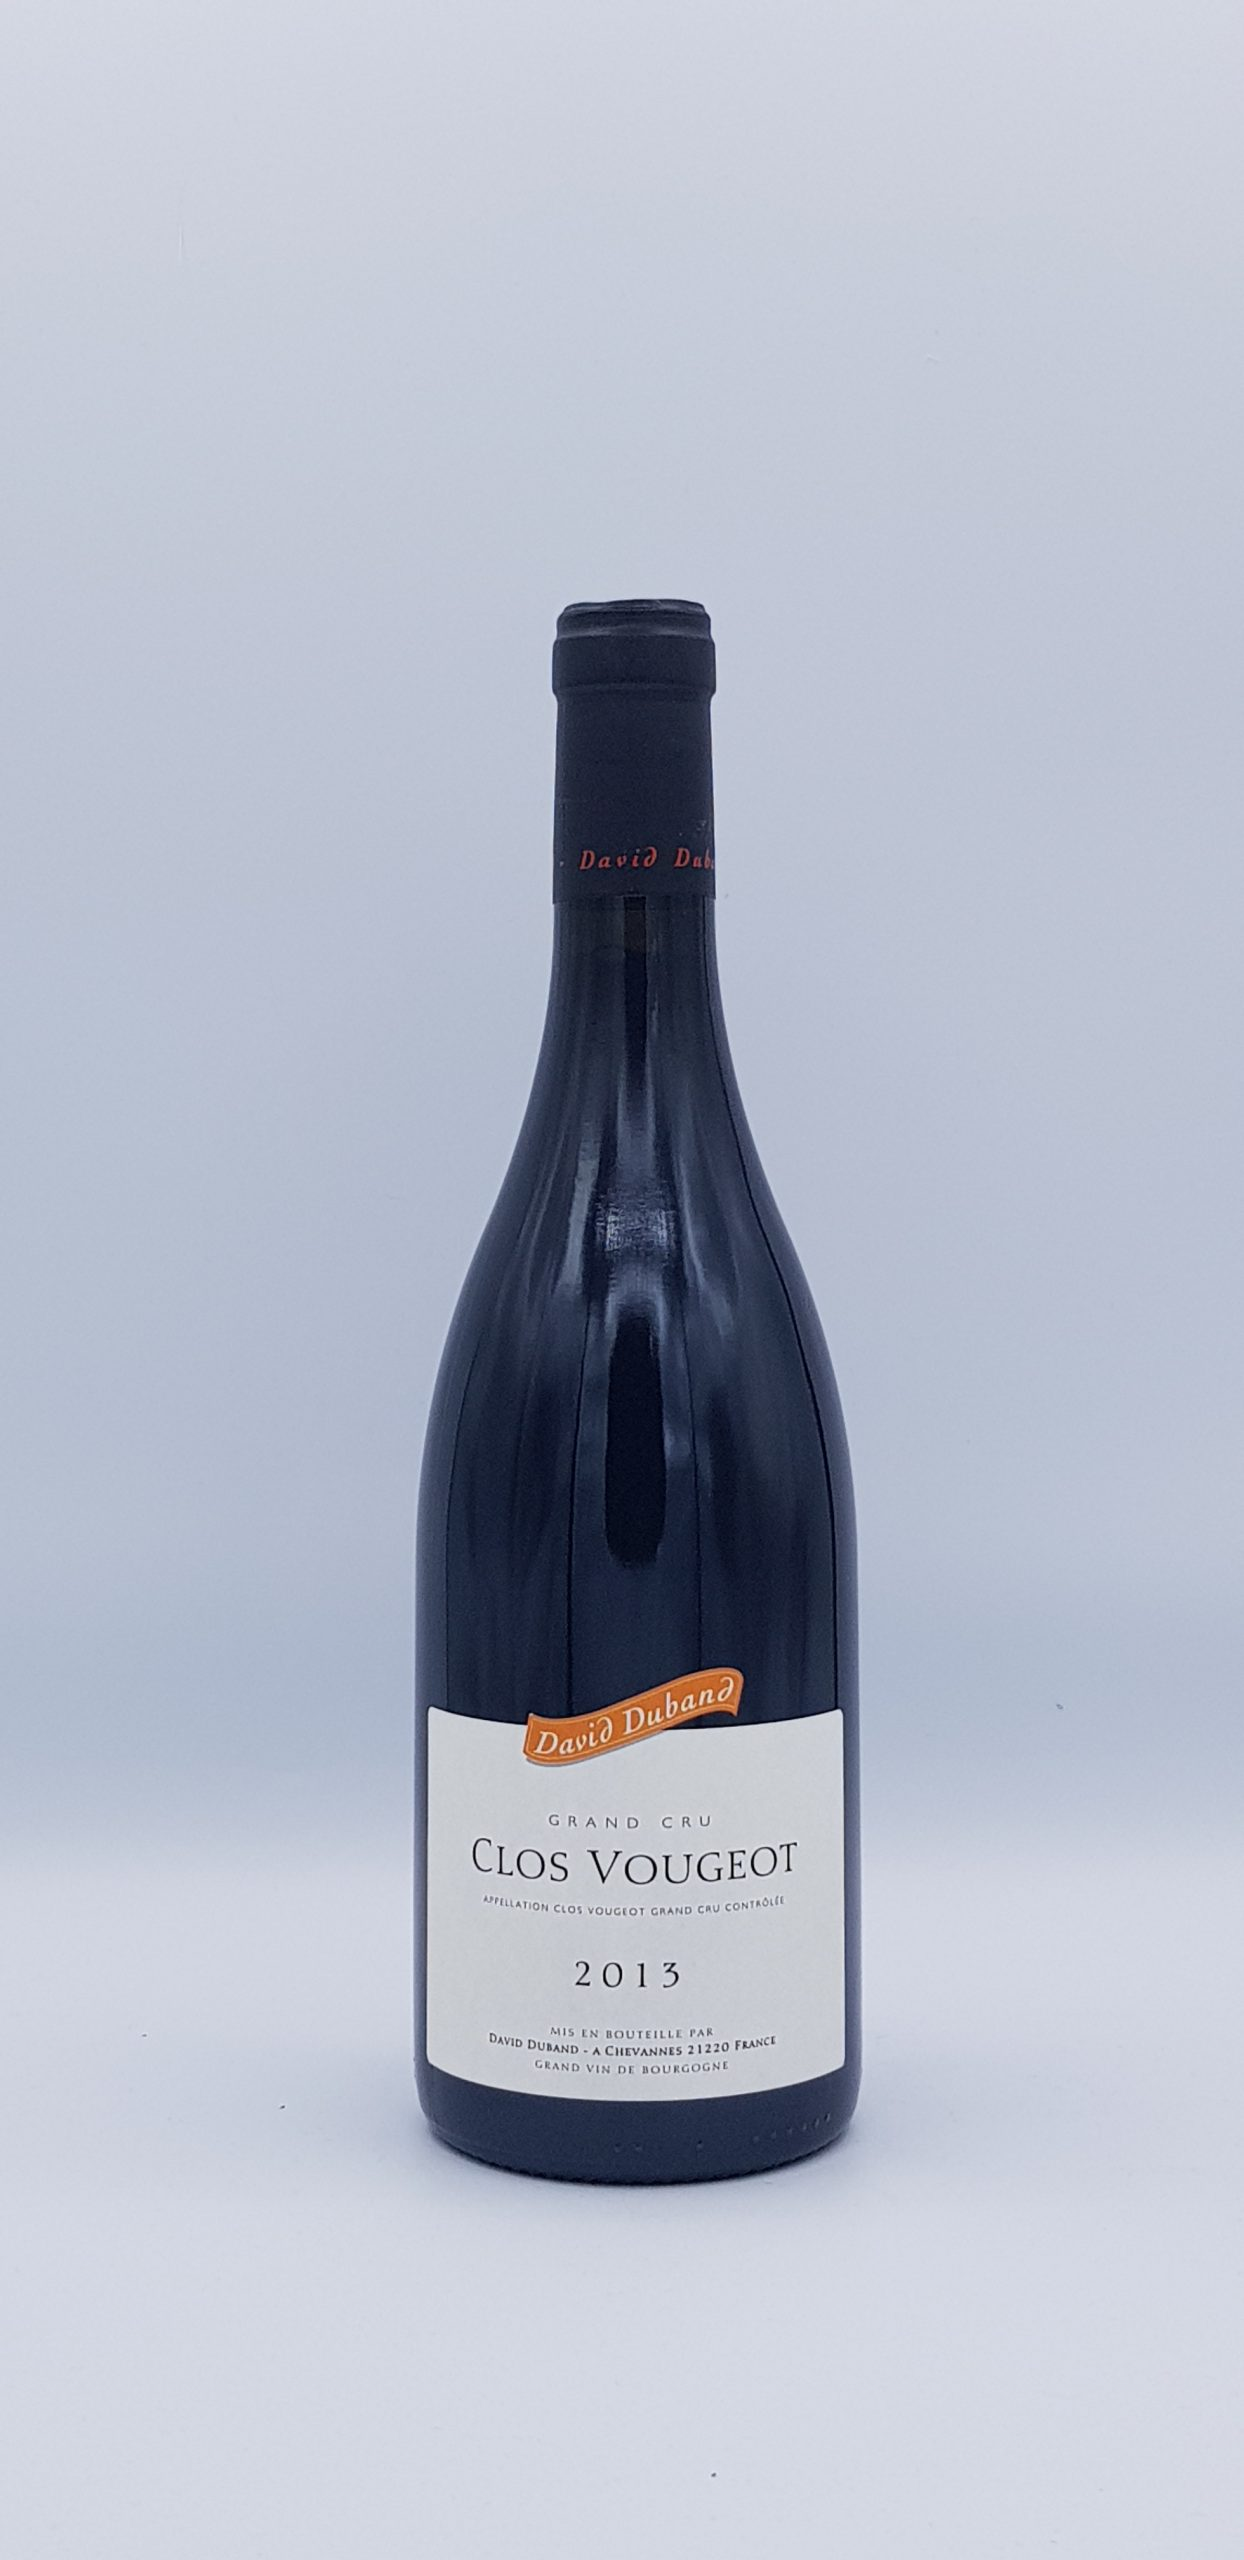 Clos Vougeot 2013 Grand Cru